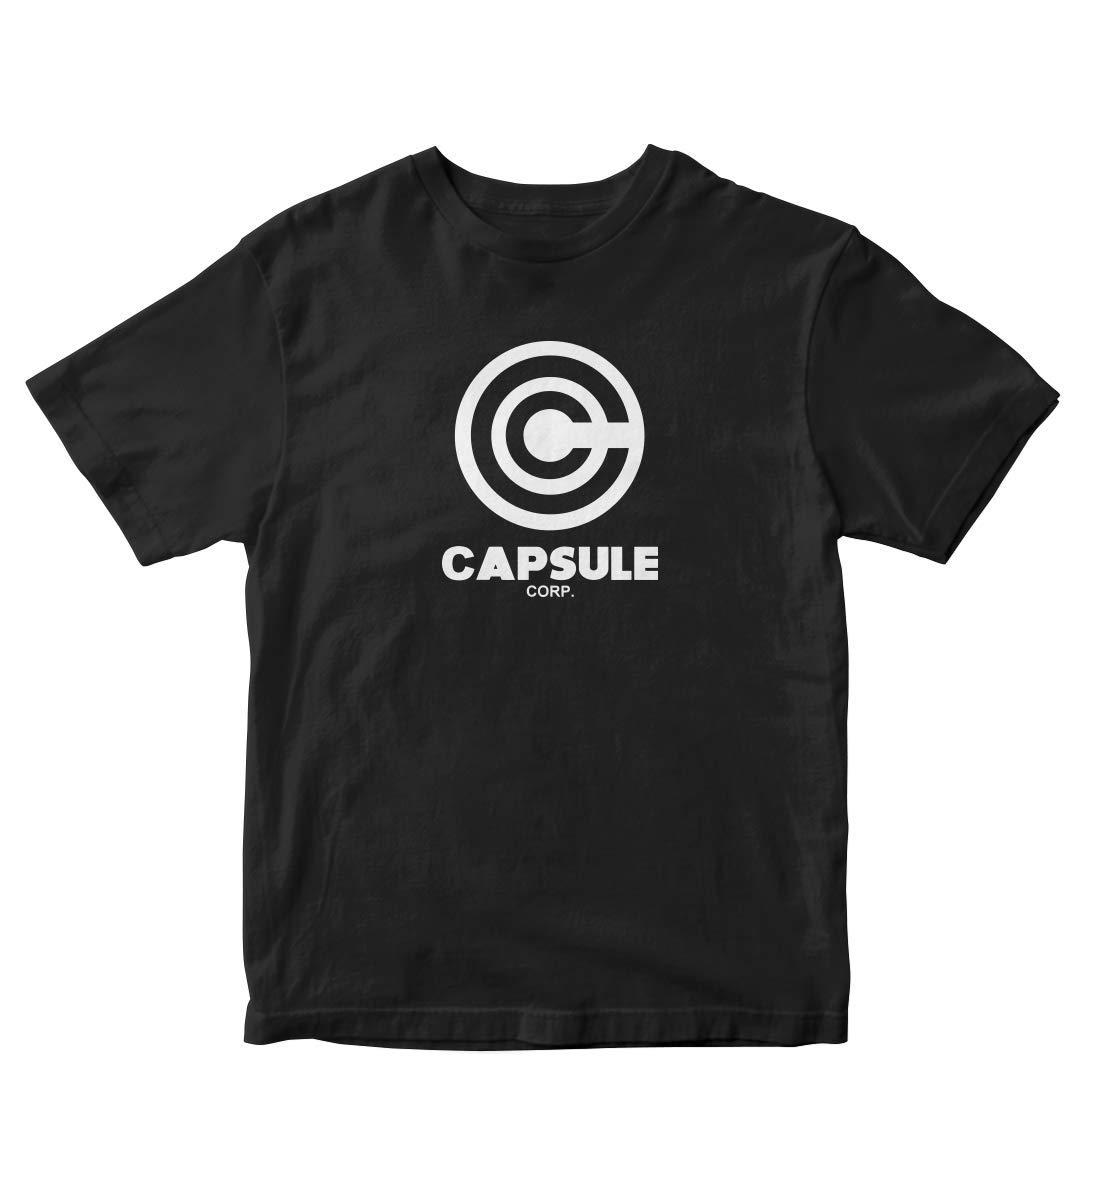 Tjsports Capsule Corp Dbgt S Shirt Black Manga Anime A251